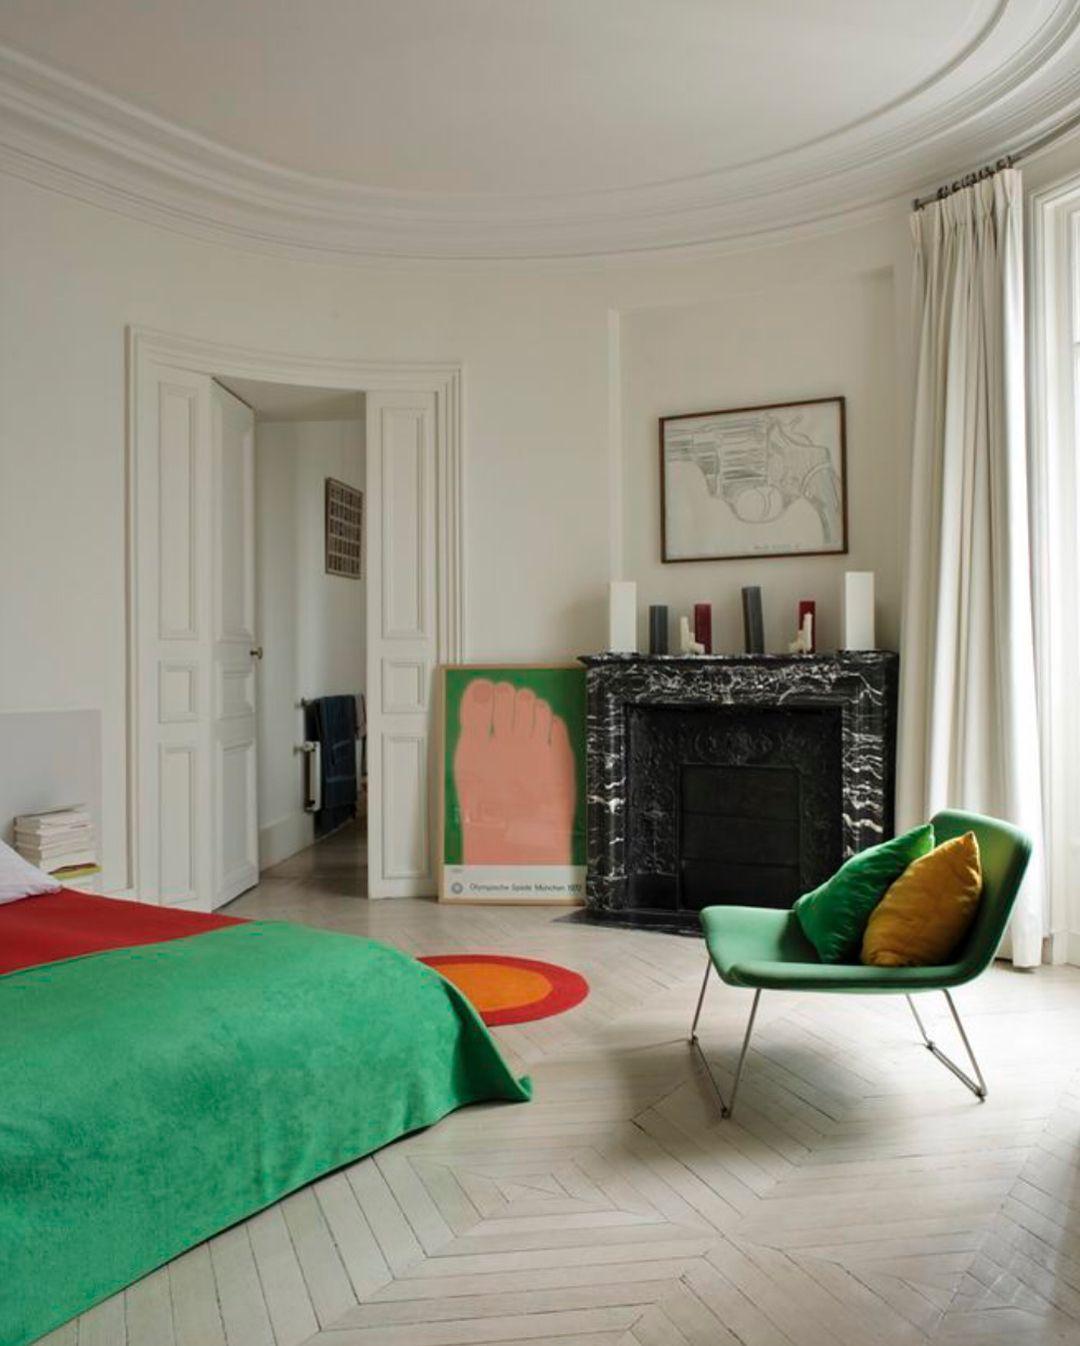 The Retro Stylish Renovation Of Rca Studio By Anderson Design Studio Bedroom Interior Home Bedroom House Interior